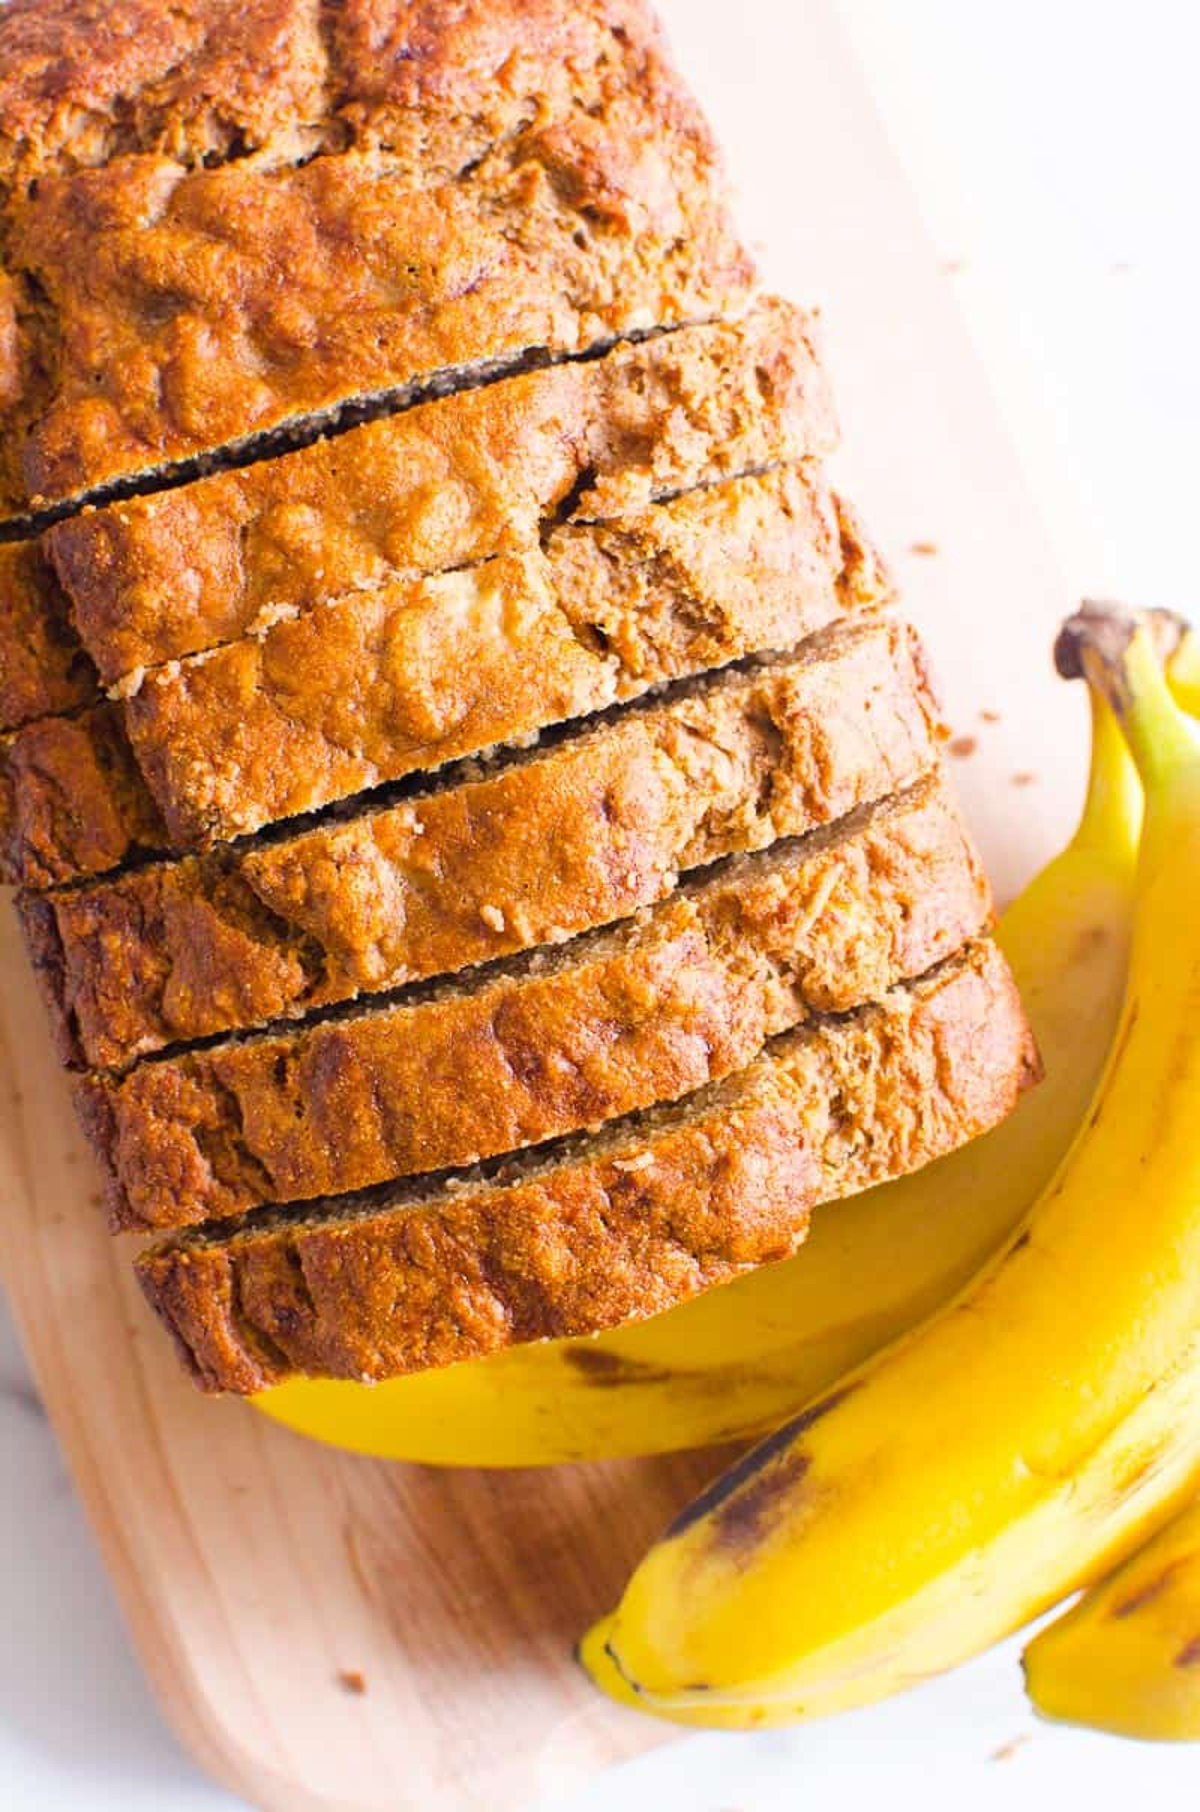 Healthy Banana Bread sliced on a cutting board